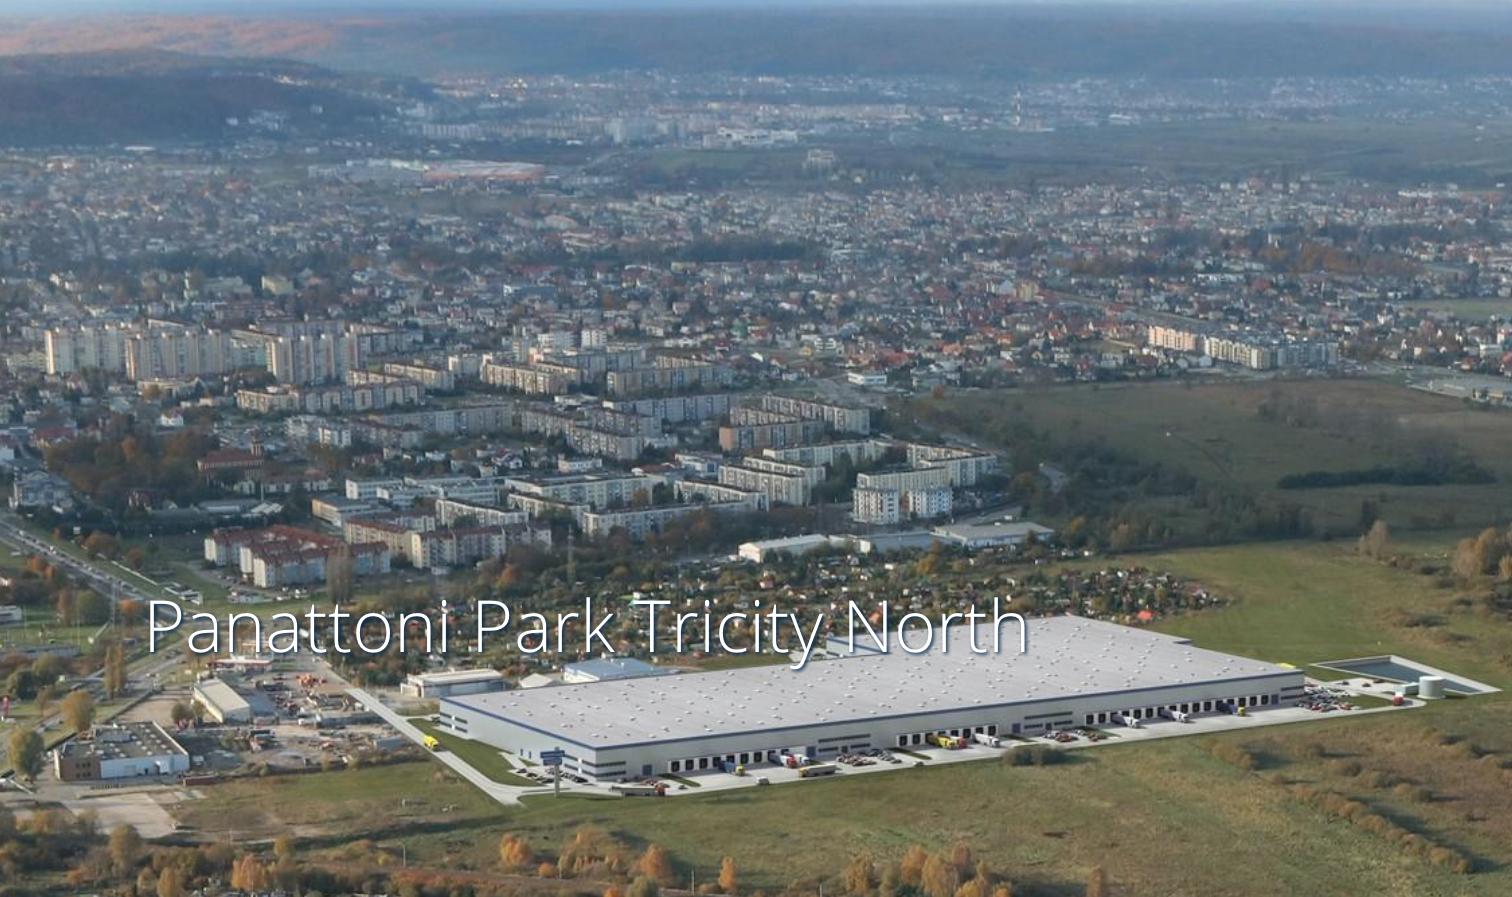 Panattoni Park Tricity North